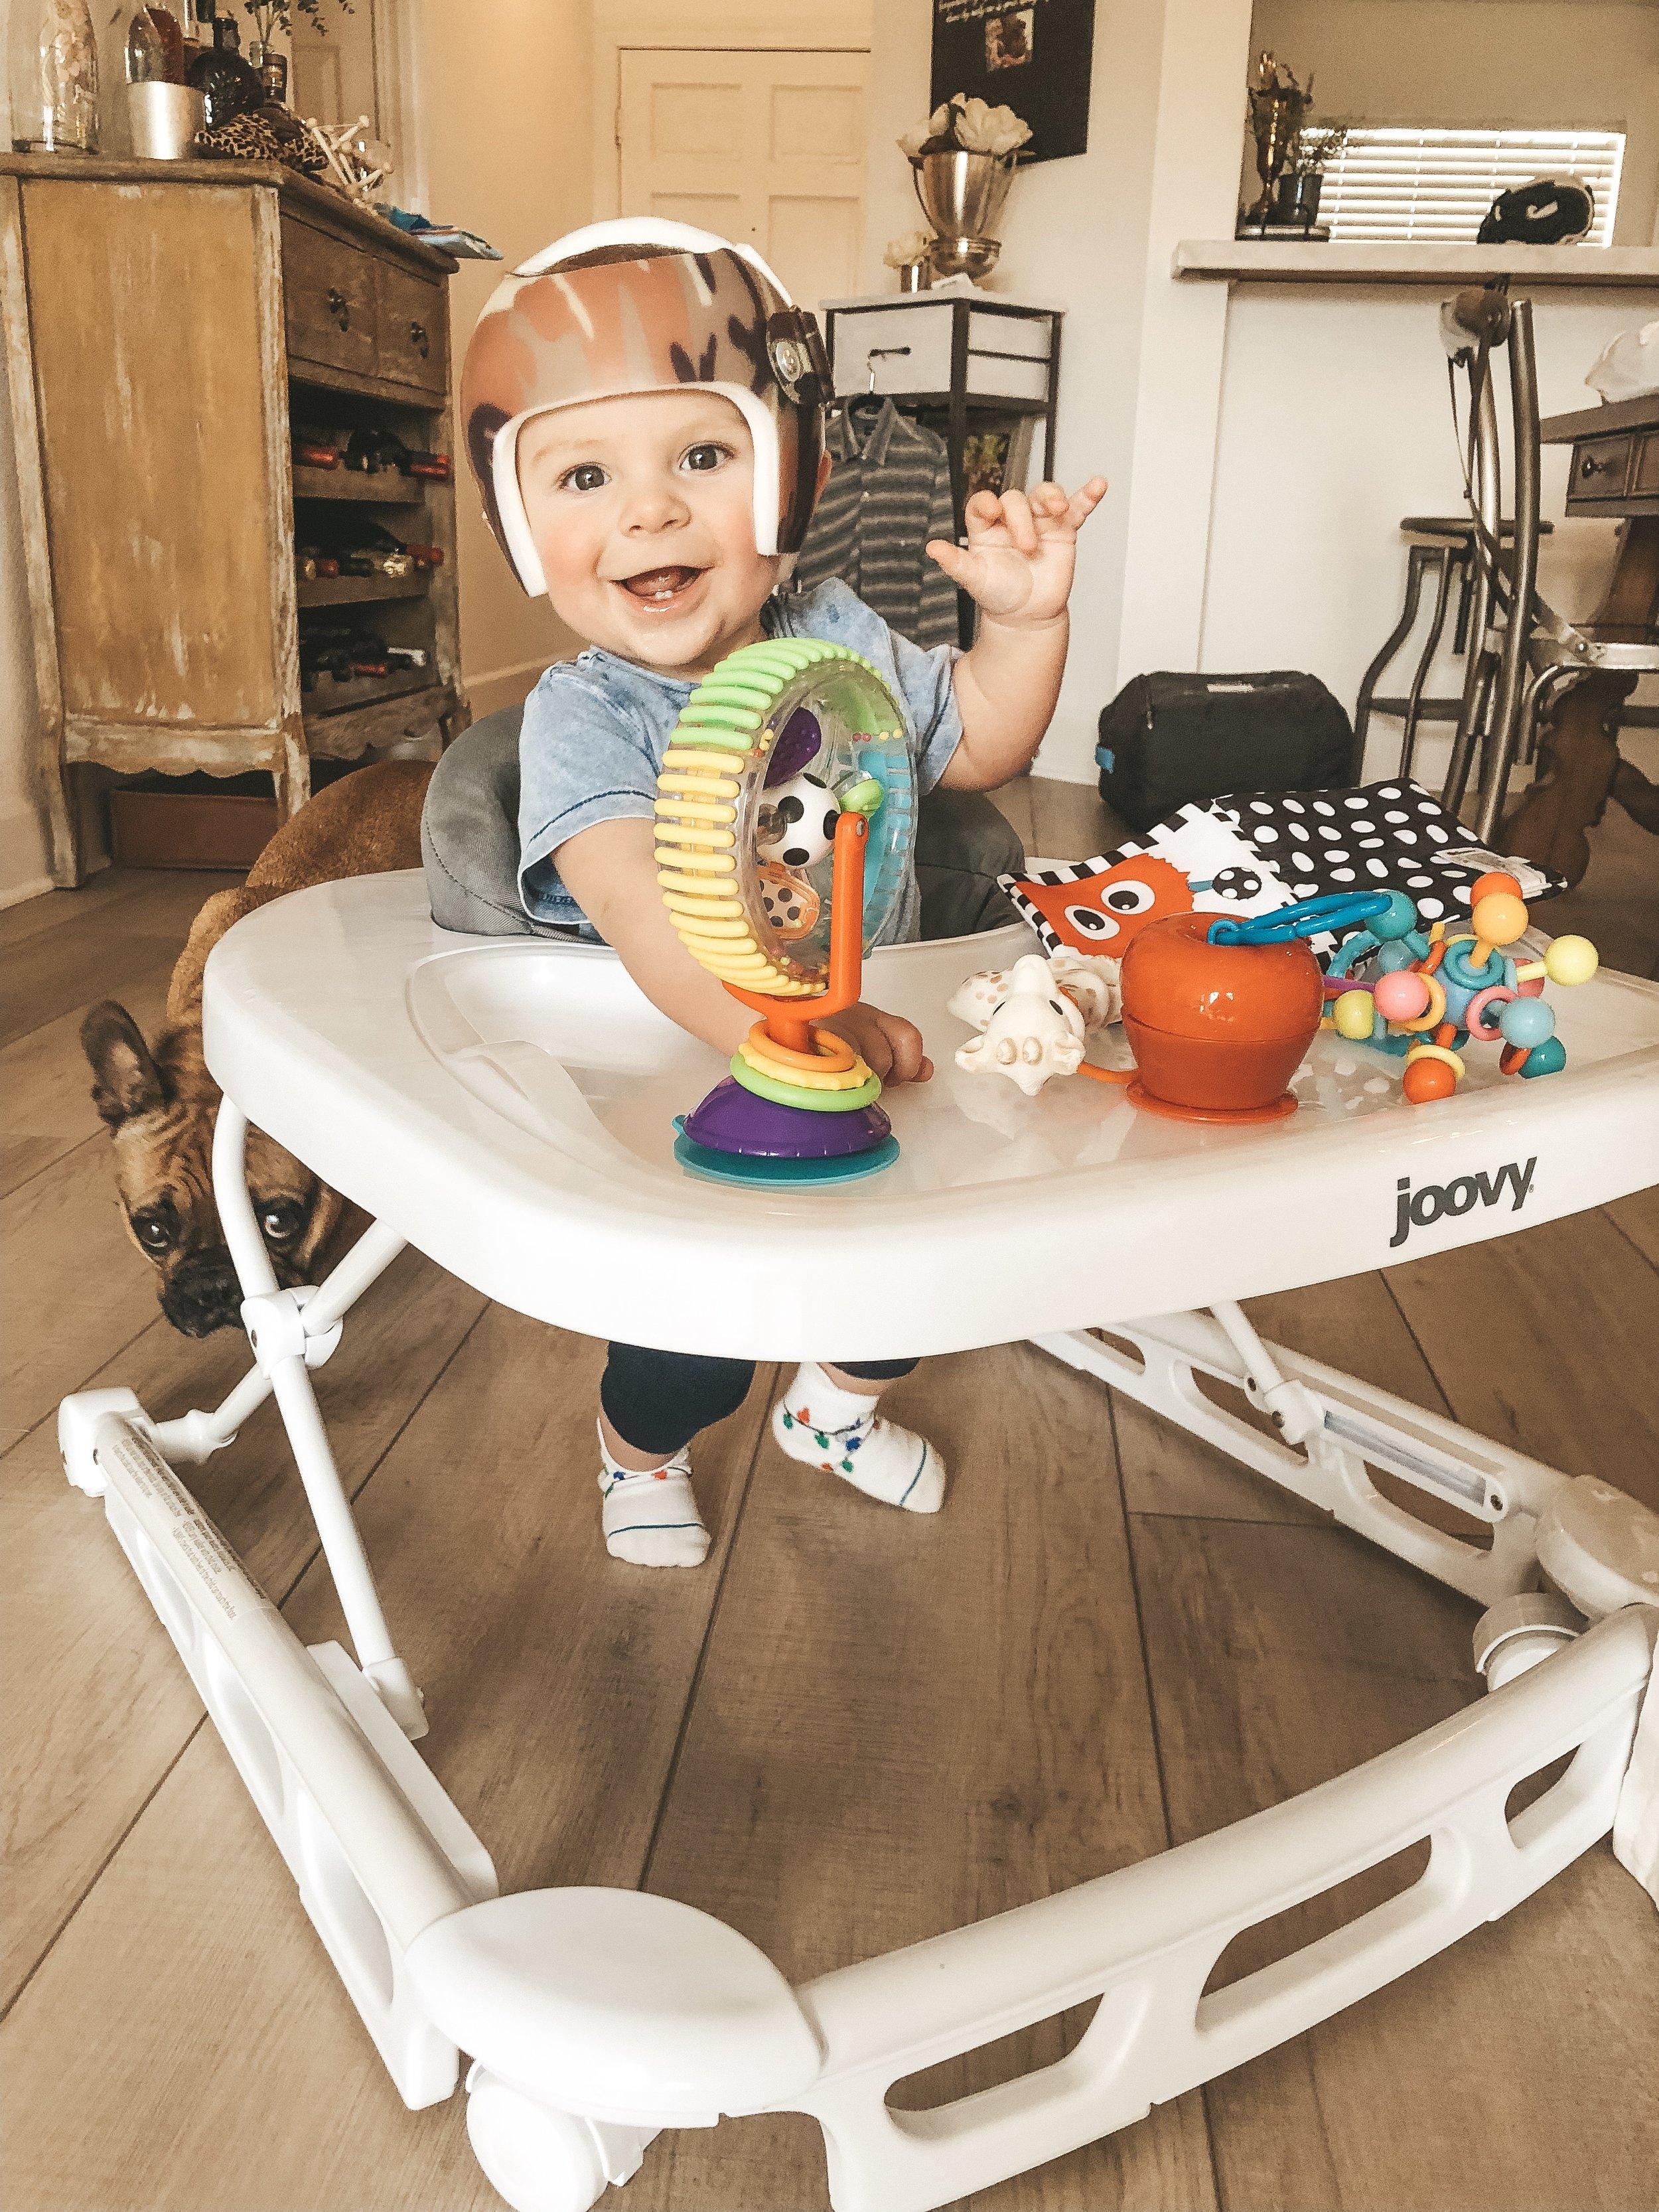 Jett Jones, 8 Months Old. Joovy Sppon Walker.  Starband helmet in camo.